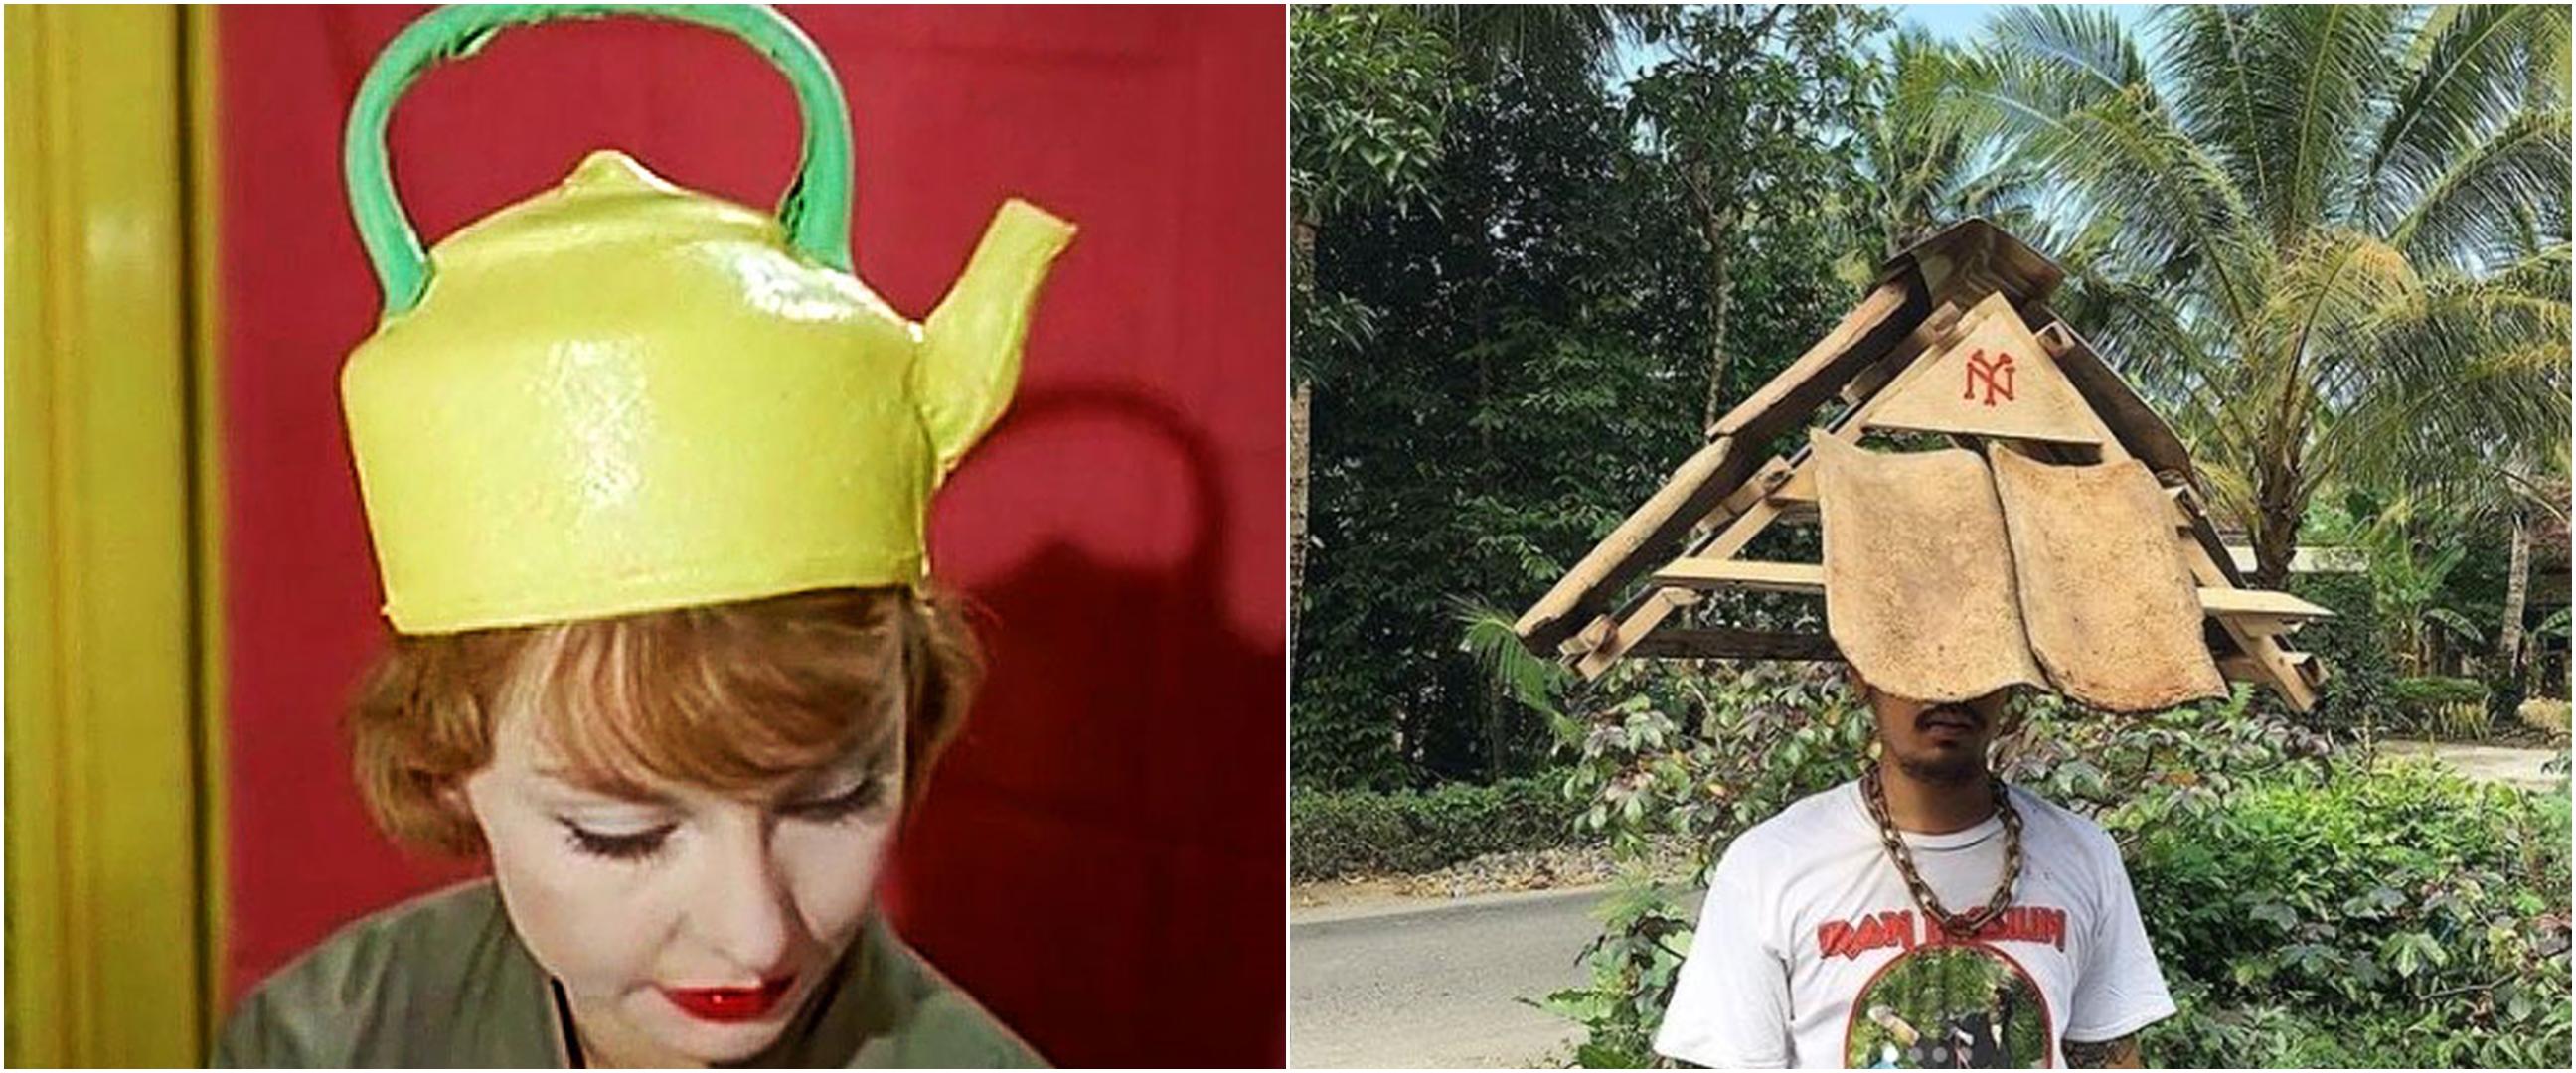 10 Penampakan topi dengan bentuk absurd ini bikin mikir dua kali